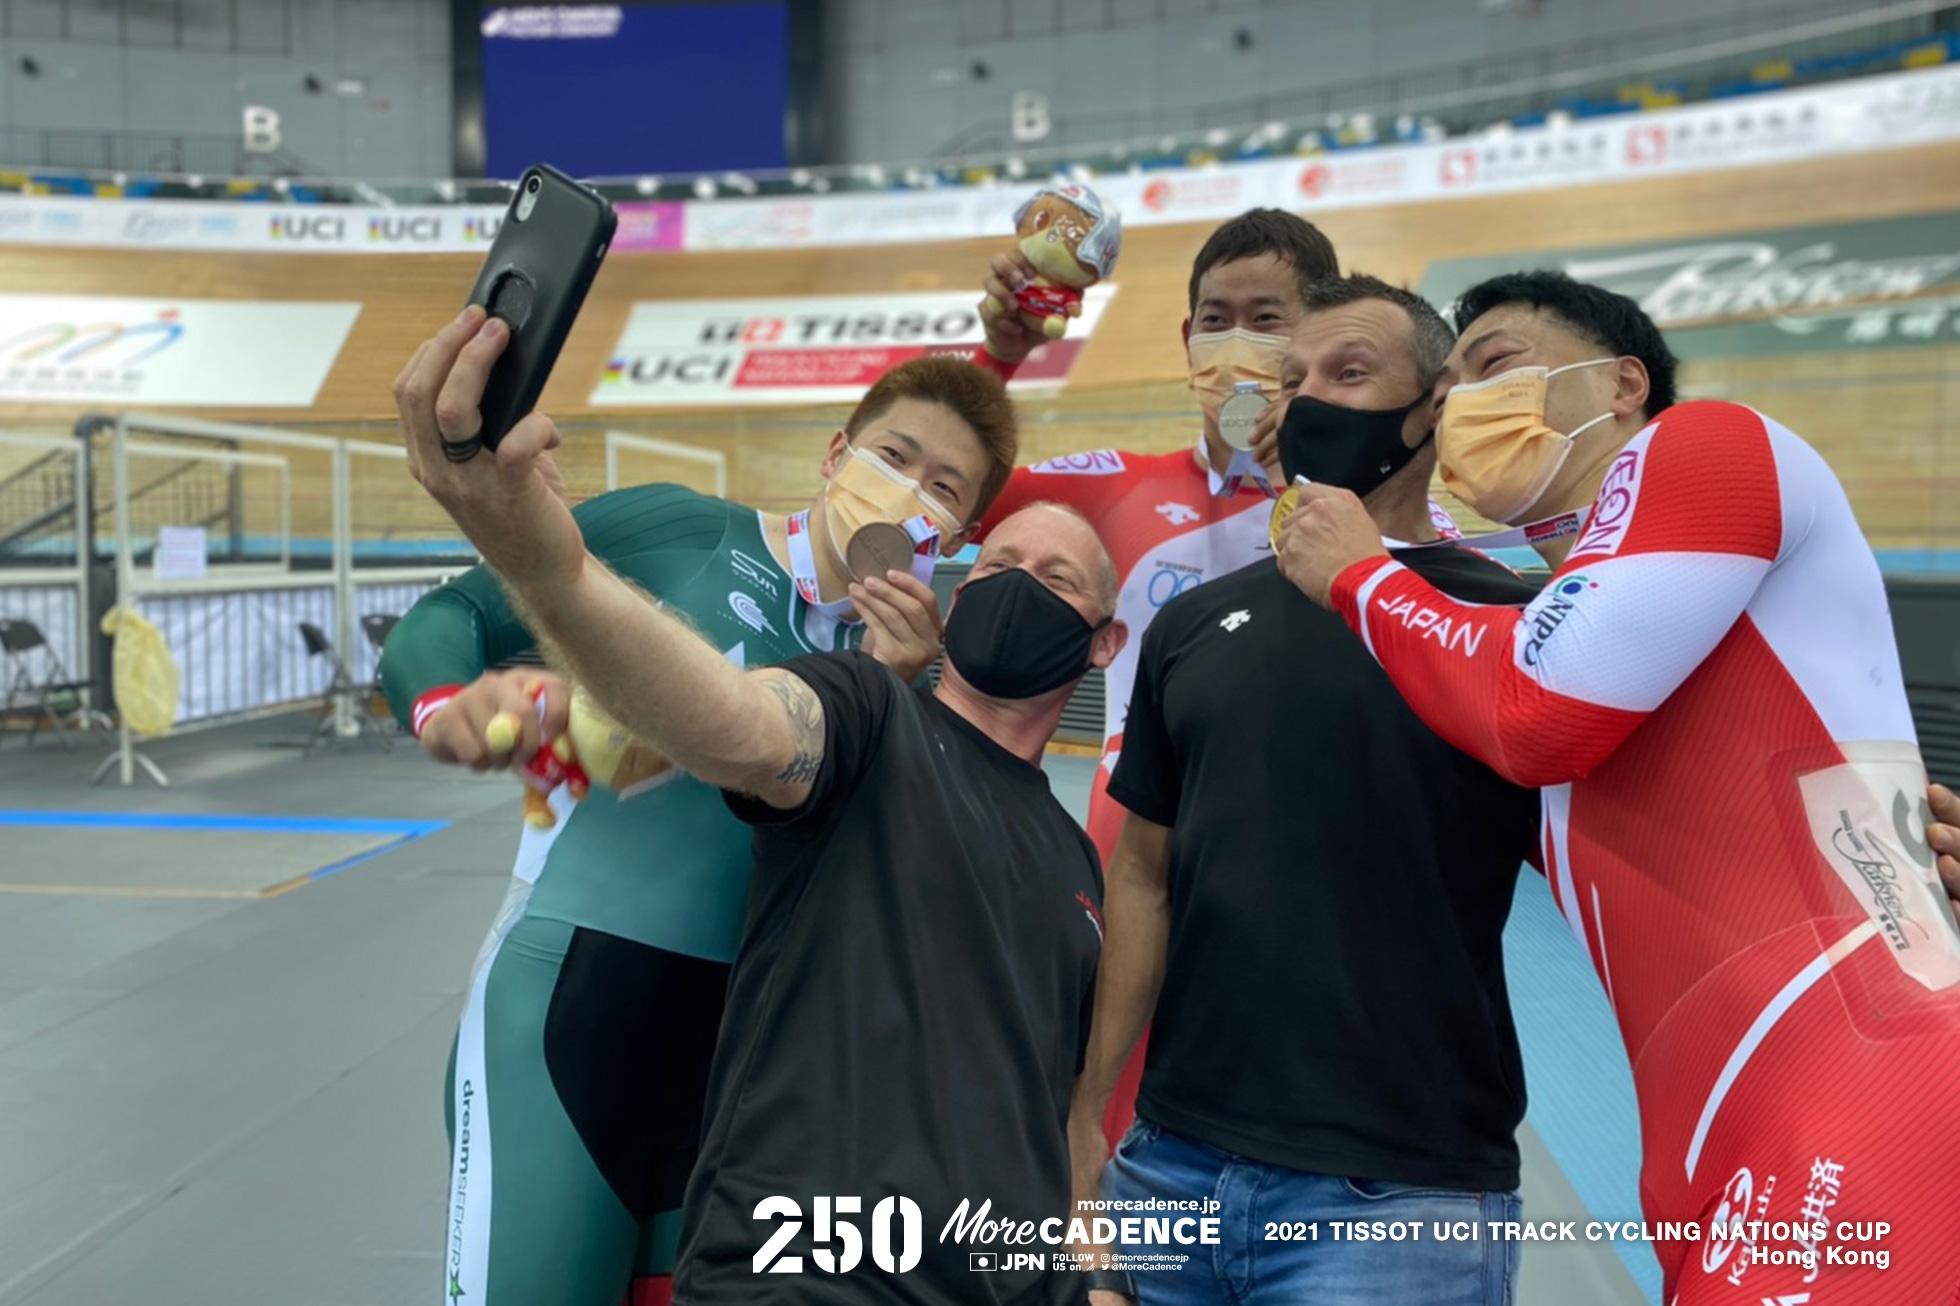 Benoit Vetu, TISSOT UCI TRACK CYCLING NATIONS CUP - HONG KONG